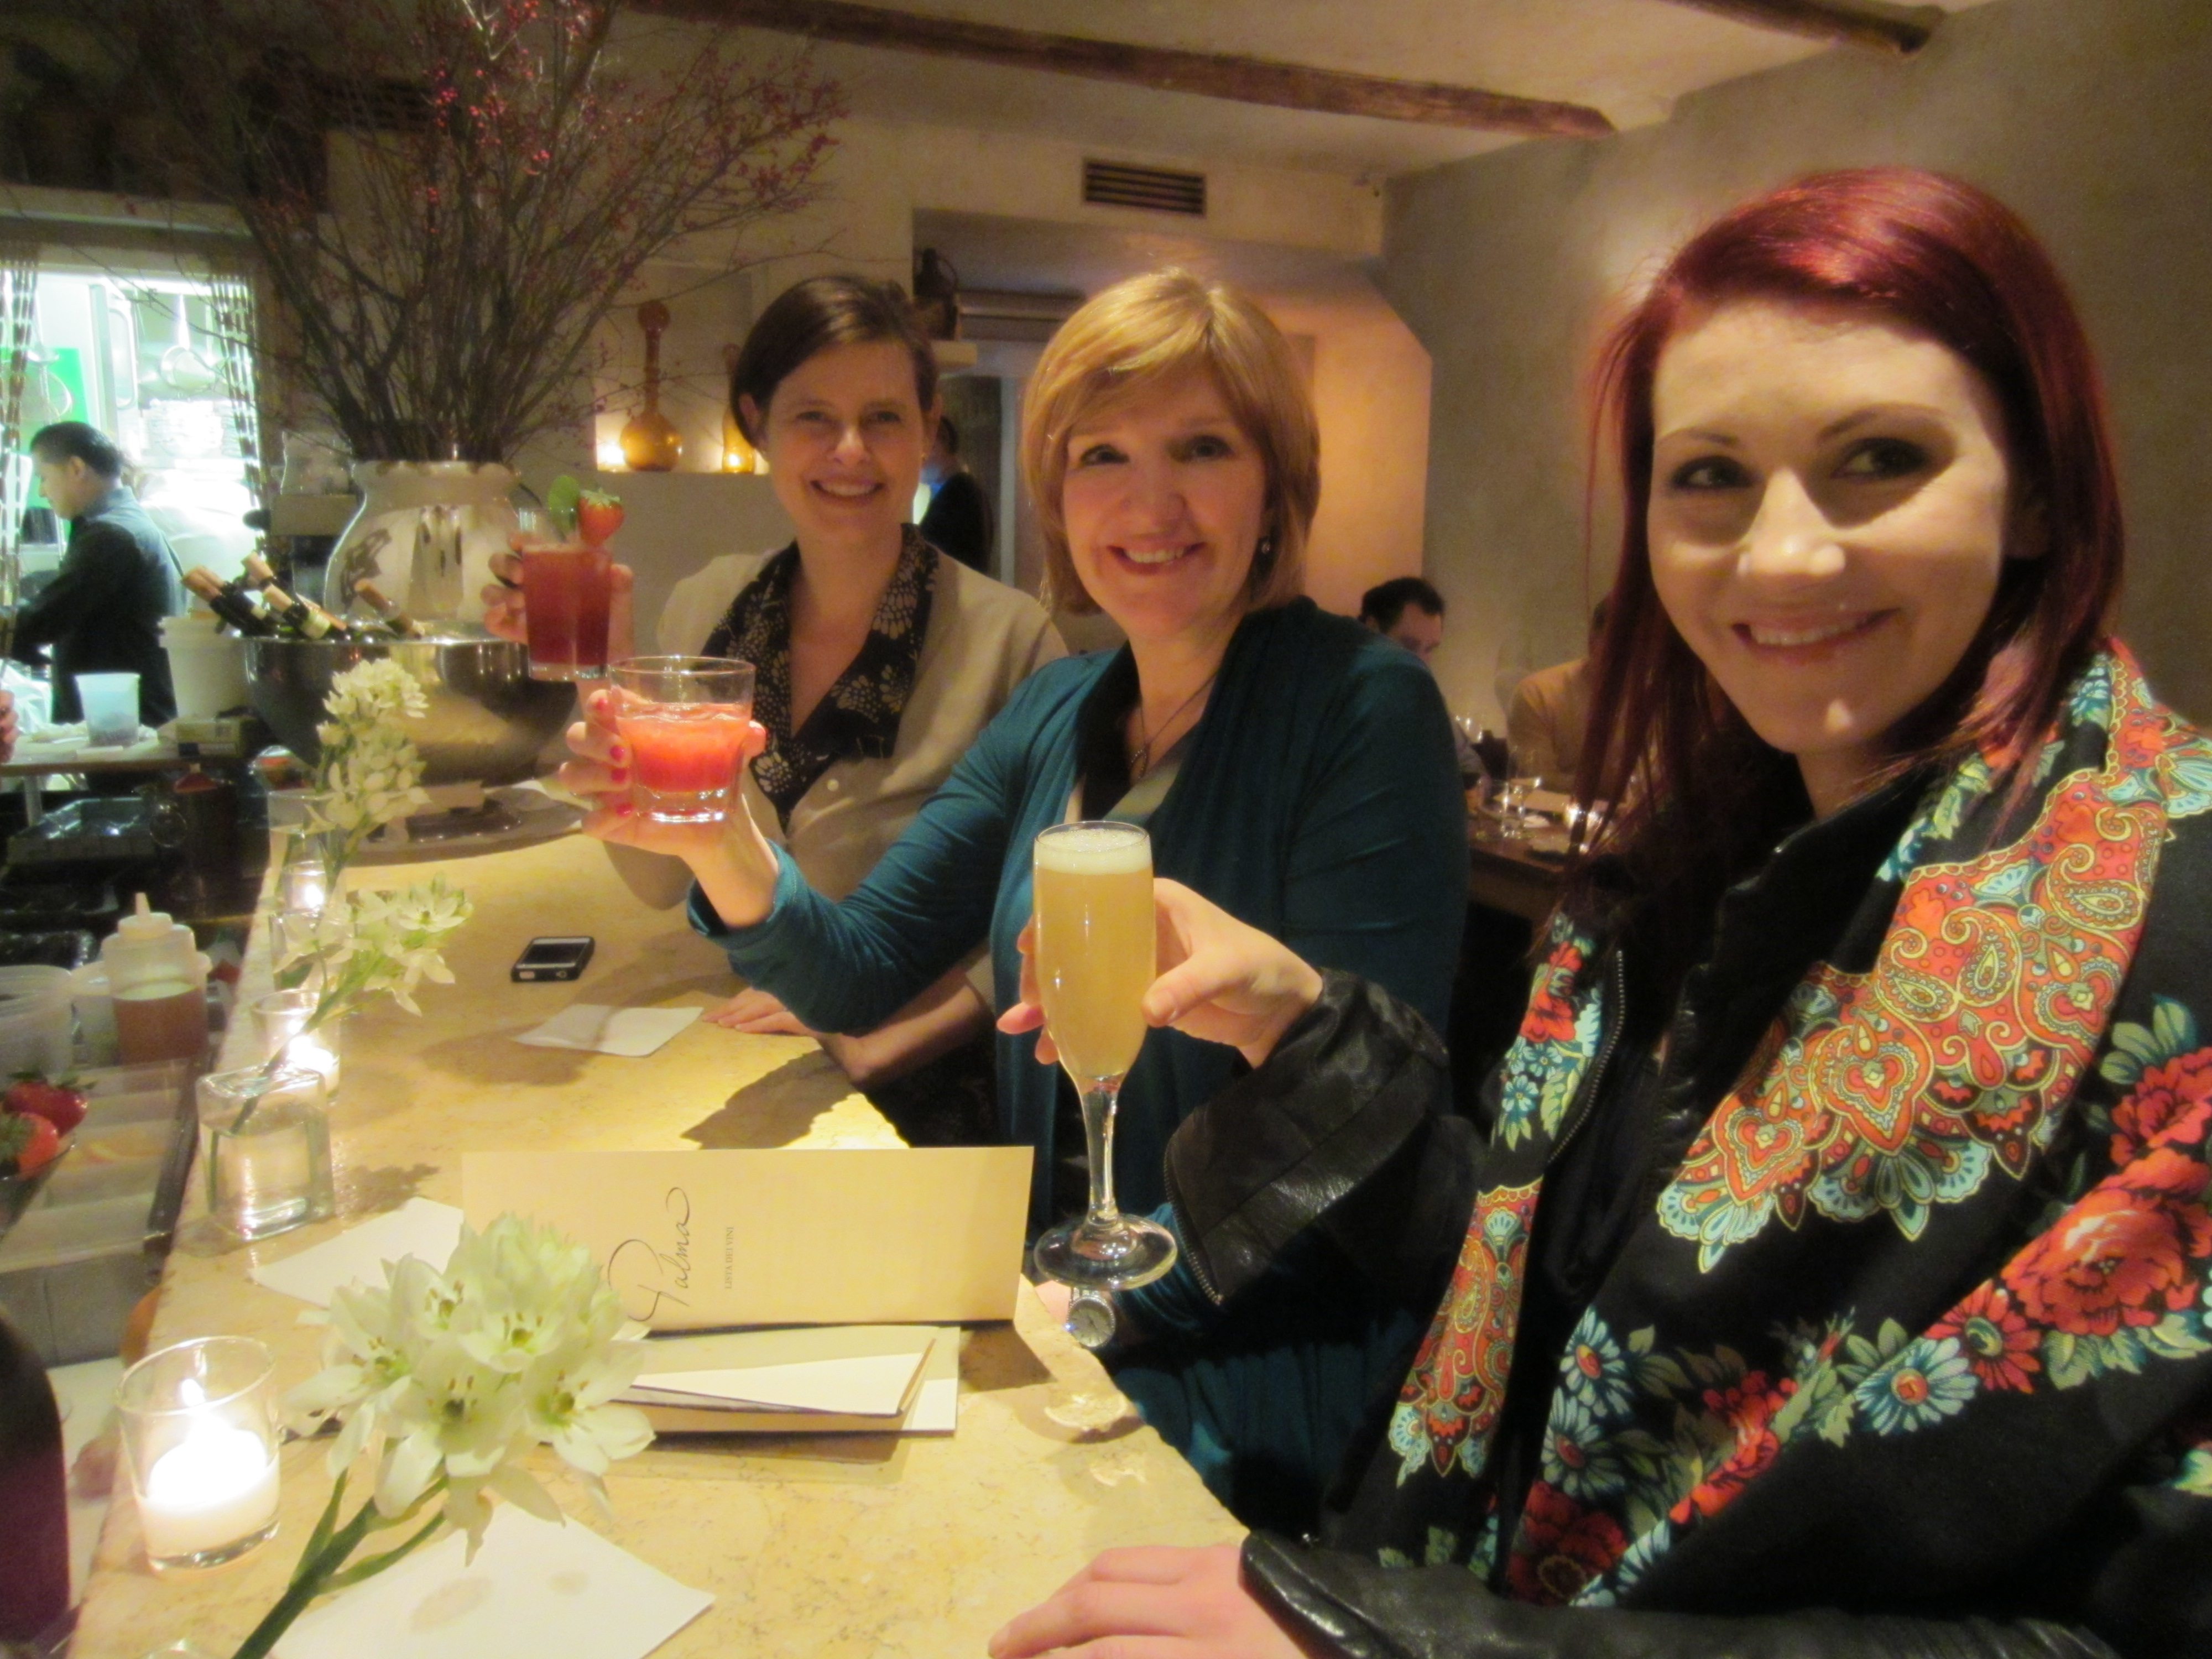 American Salon's Lotus Abrams and Jamie Corkran and contest-winner Liubov Rachmanina